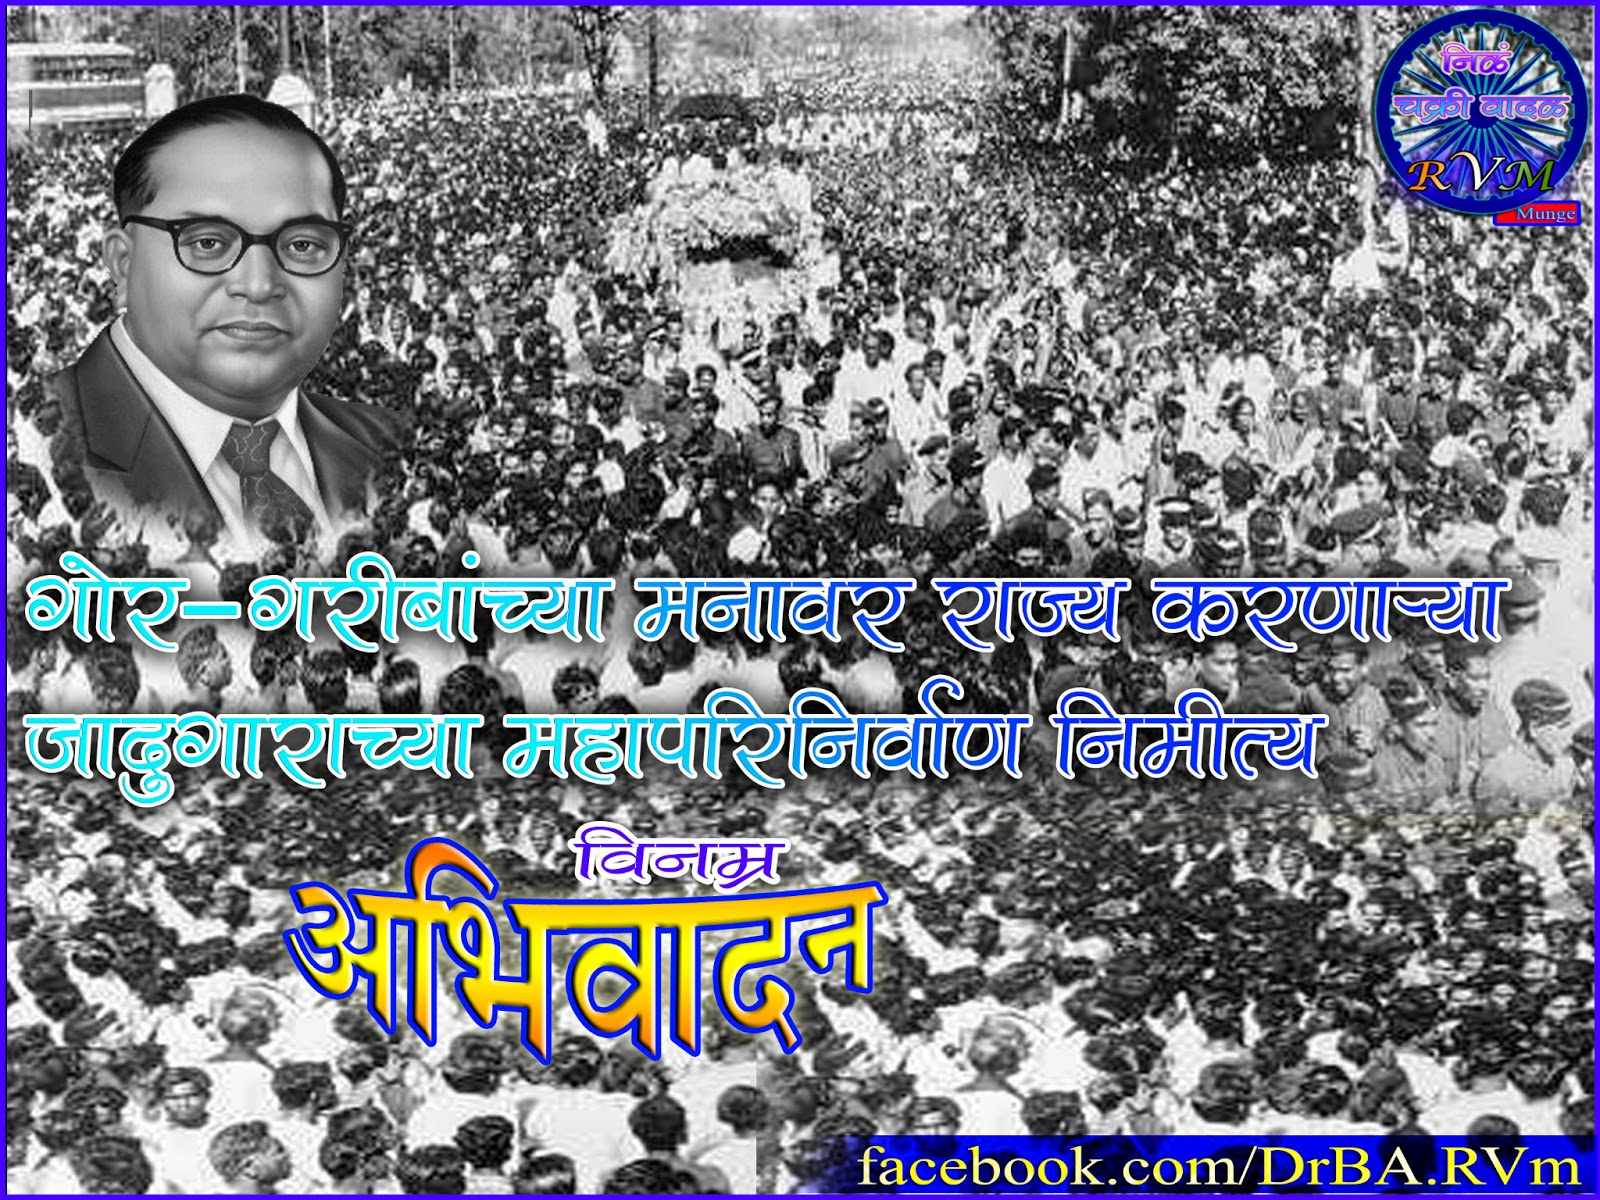 Dr Ambedkar Images Wallpapers Hd Dr Babasaheb Ambedkar Bhimrao Ramji Ambedkar